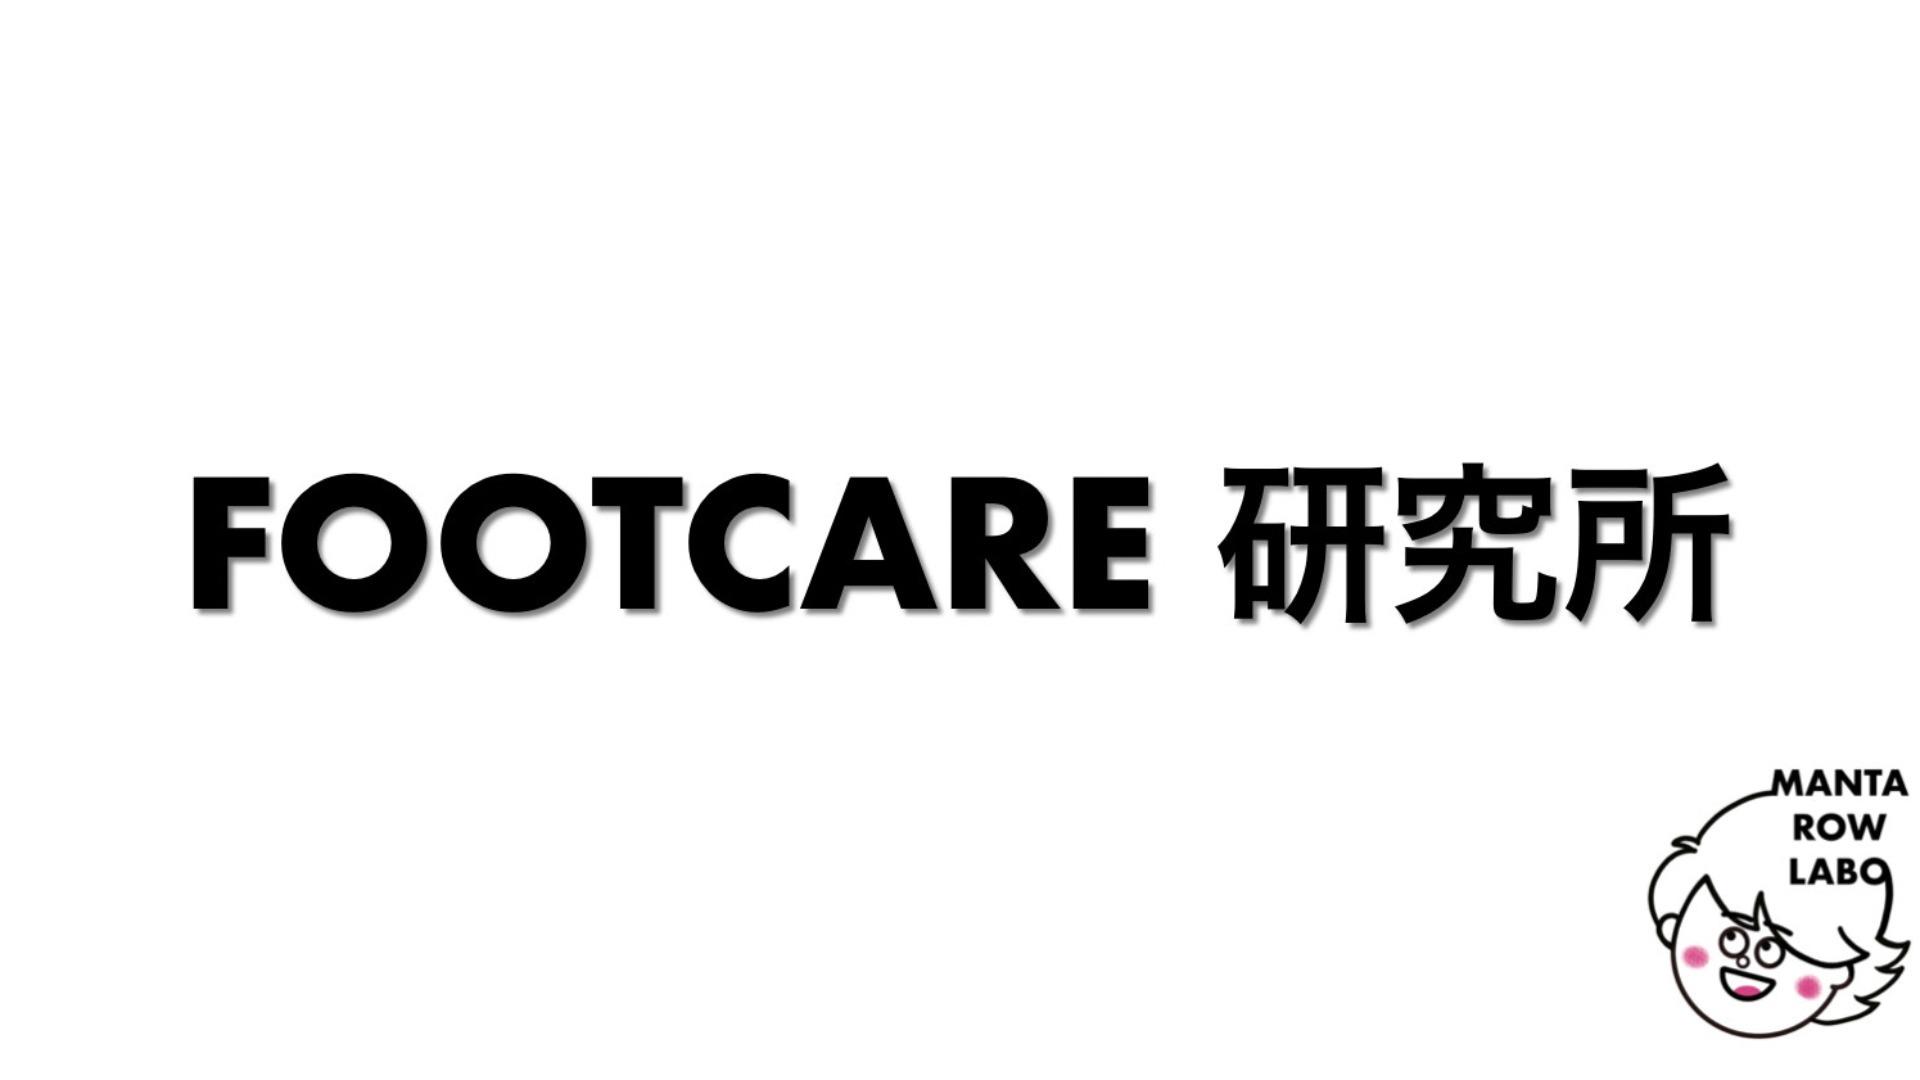 FOOTCARE研究所 by mantarow_labo